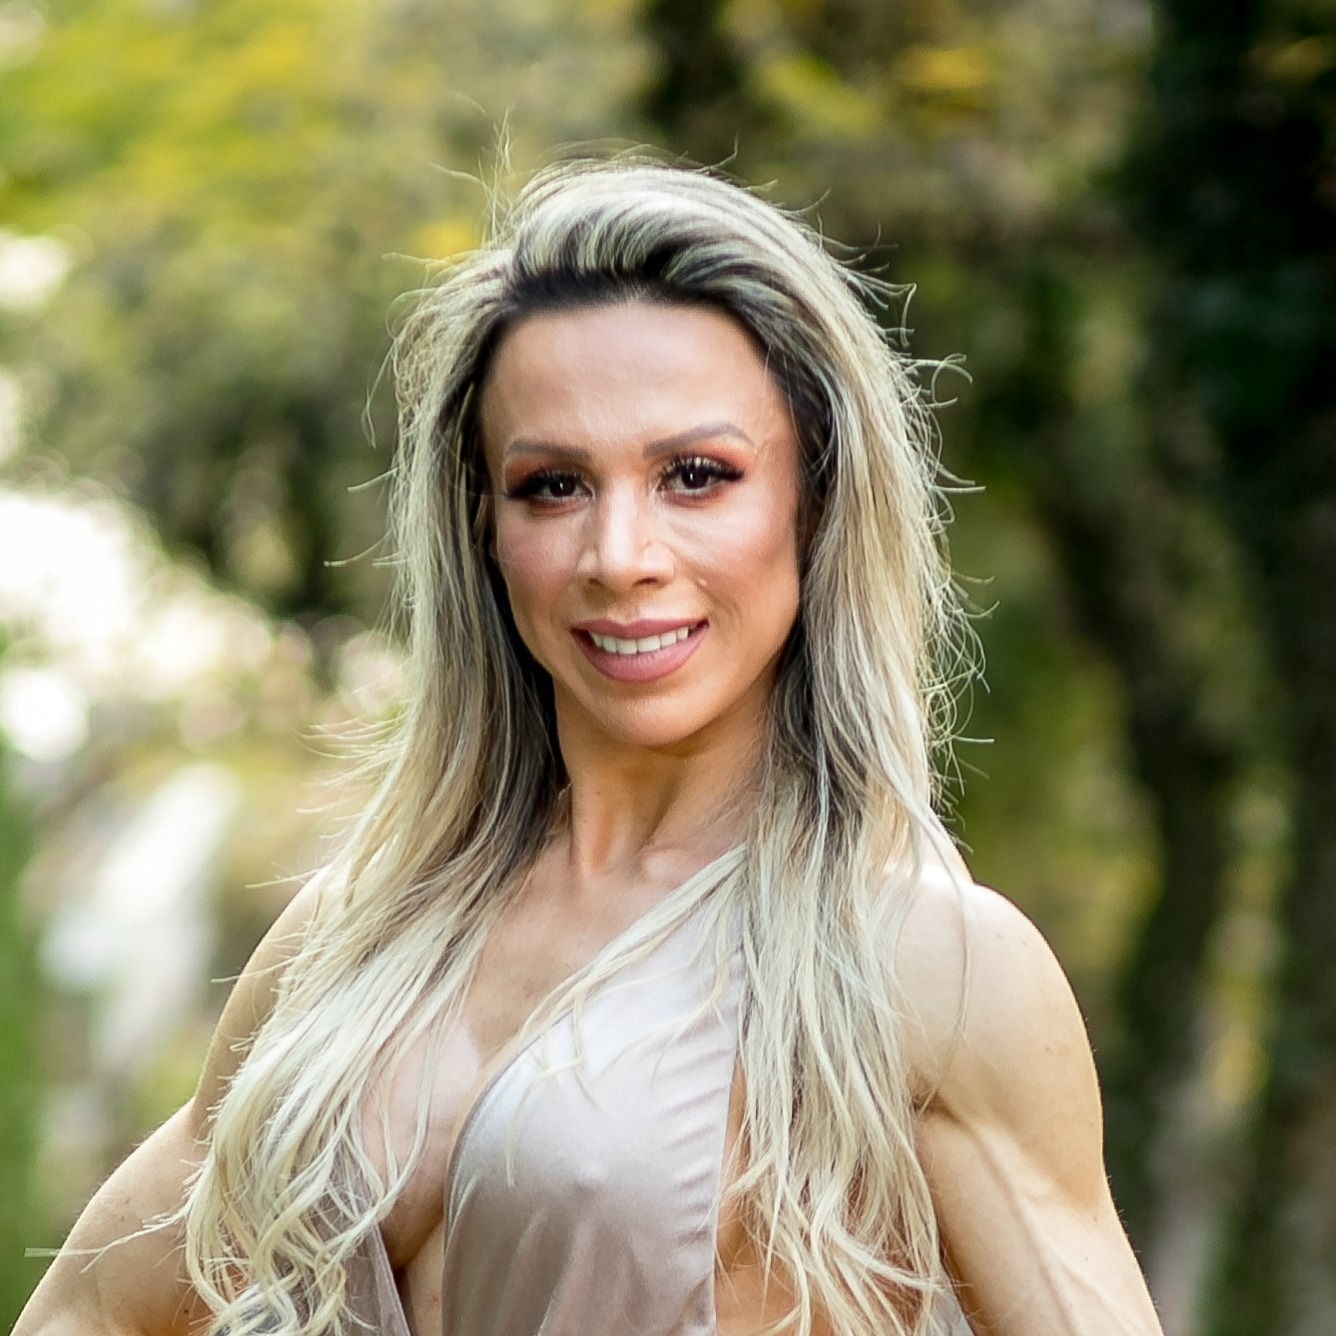 Tania Raquel Stormovski de Andrade